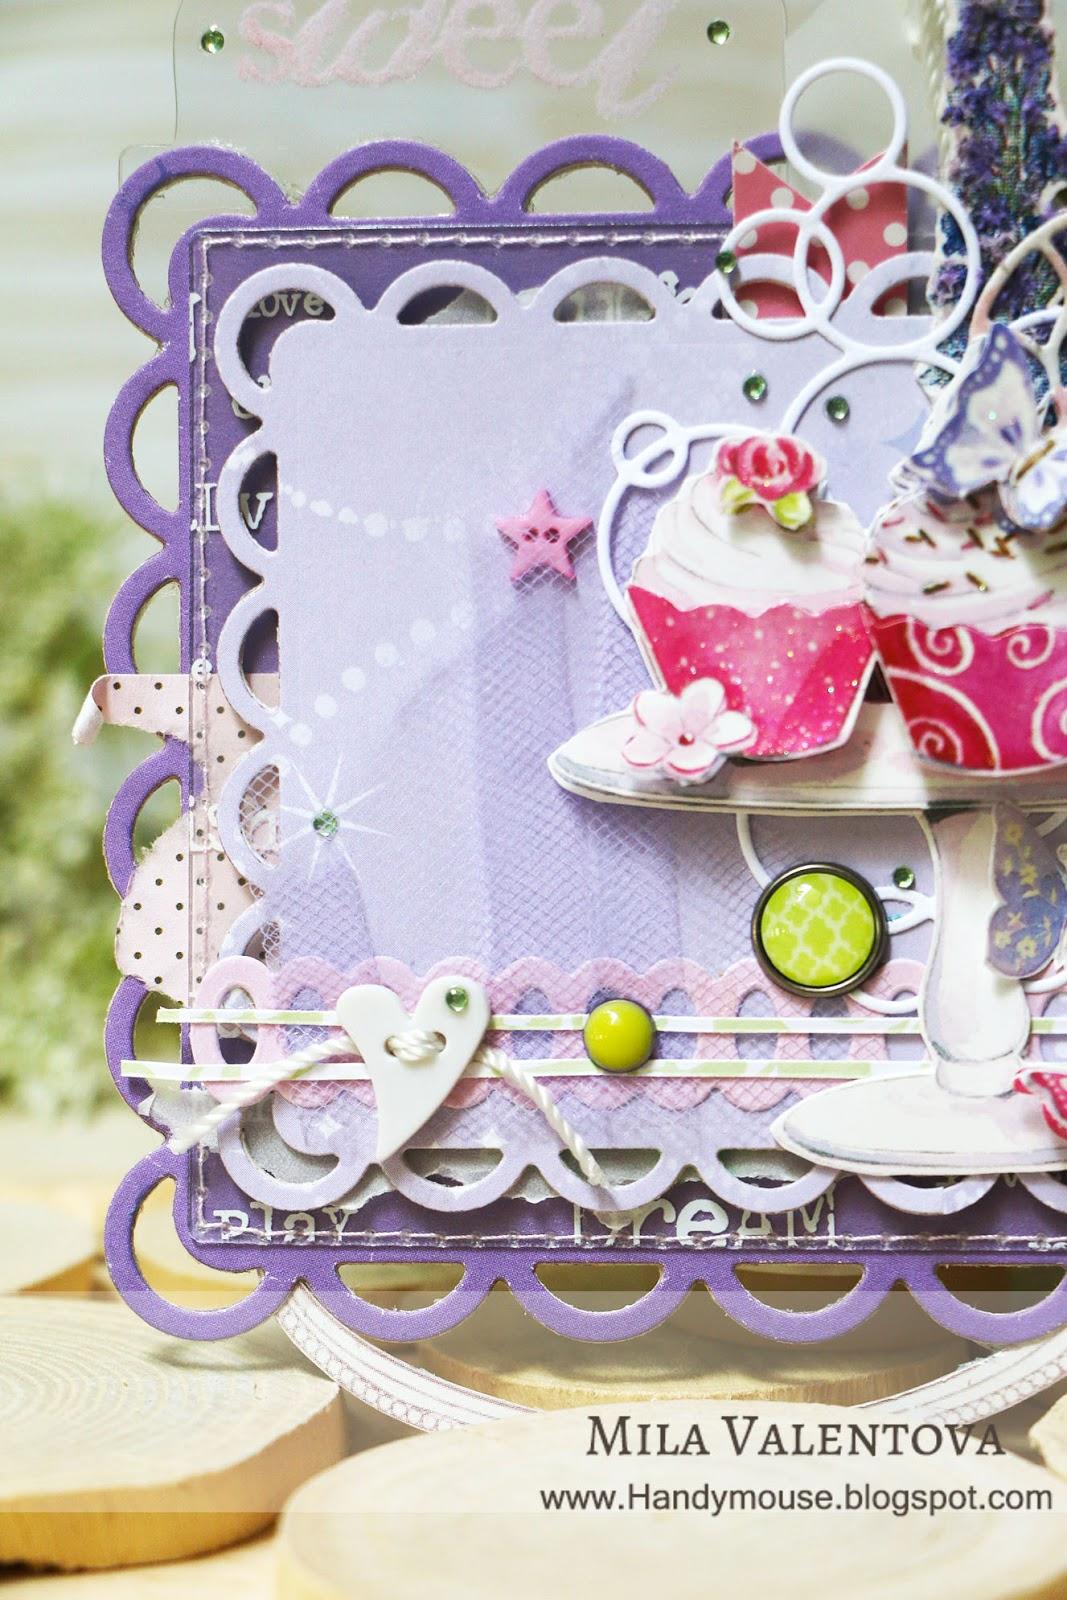 Магнит. Лаванда, горная лаванда. Сладости и розовый цвет. Мила Валентова.